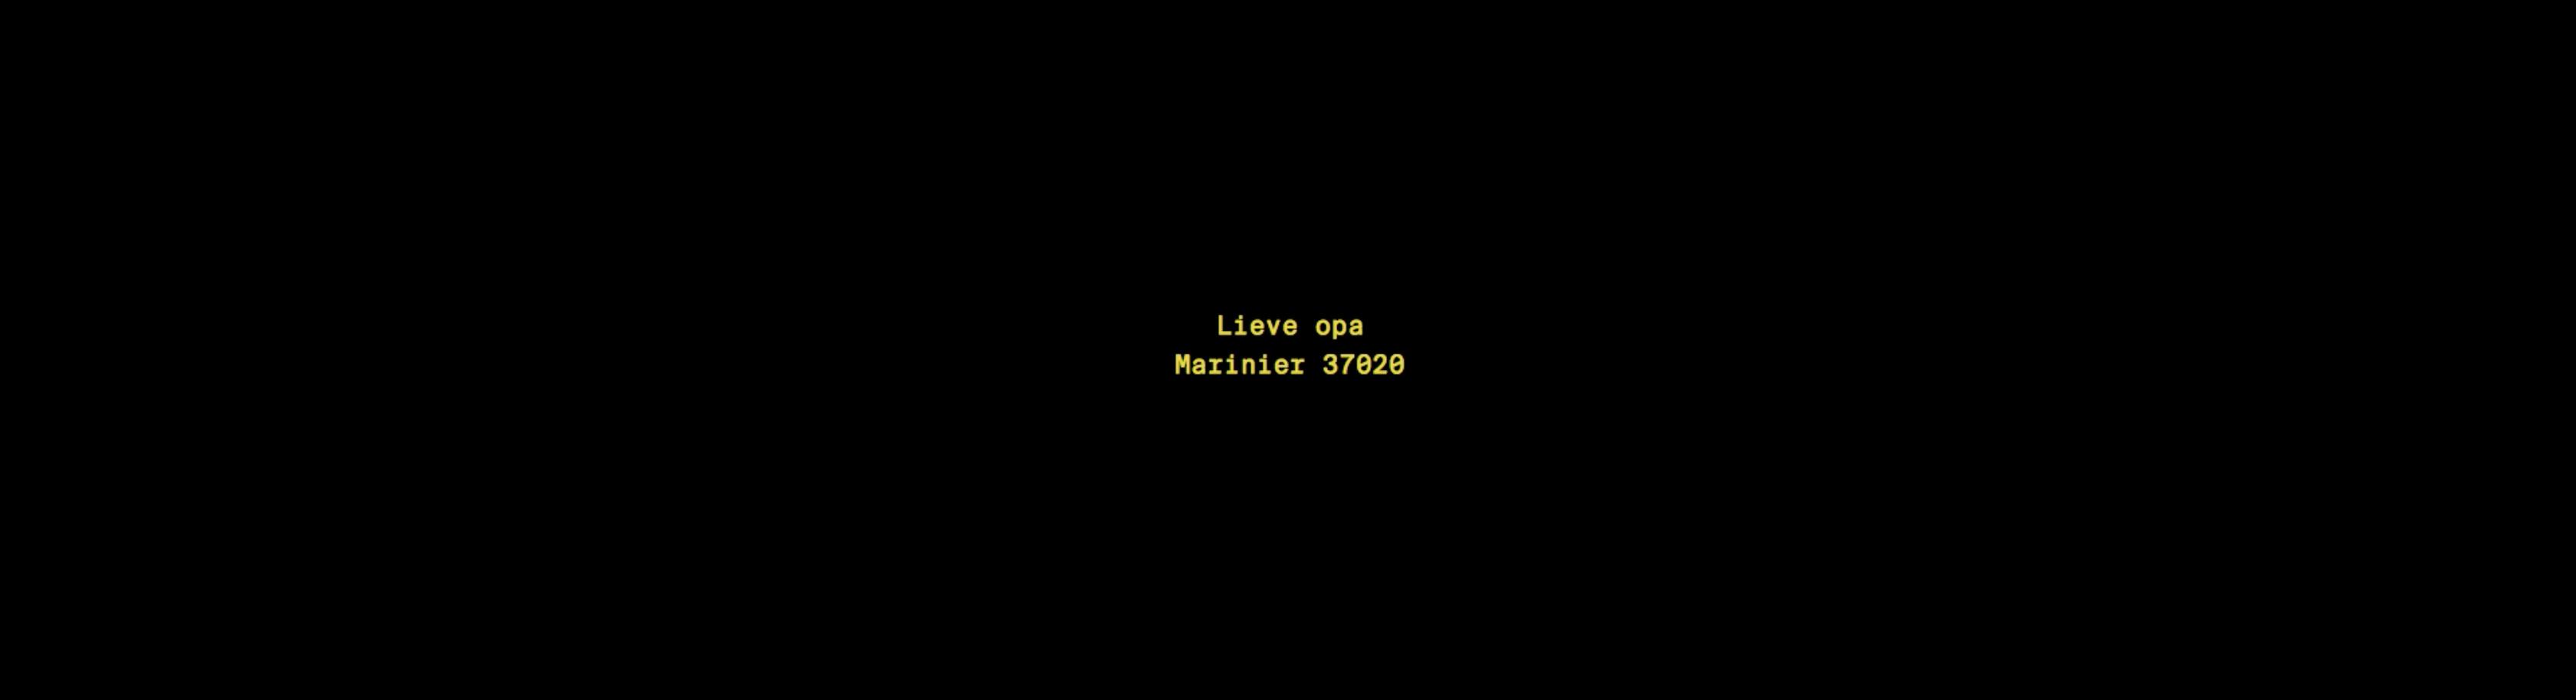 Marinier 37020 – cover